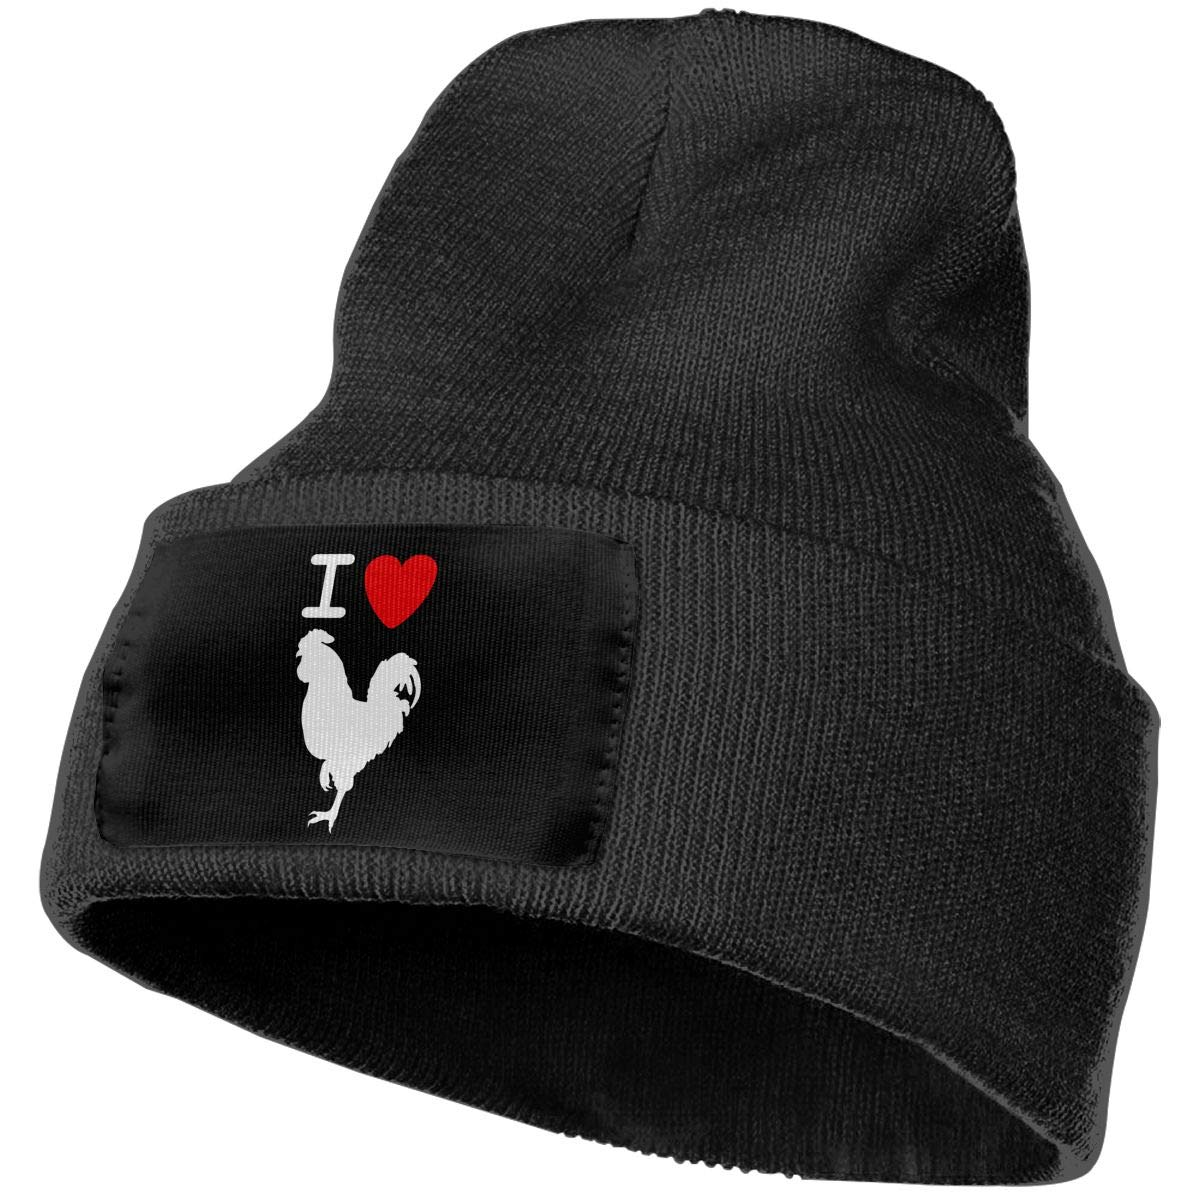 Men /& Women I Love Cock Outdoor Warm Knit Beanies Hat Soft Winter Knit Caps